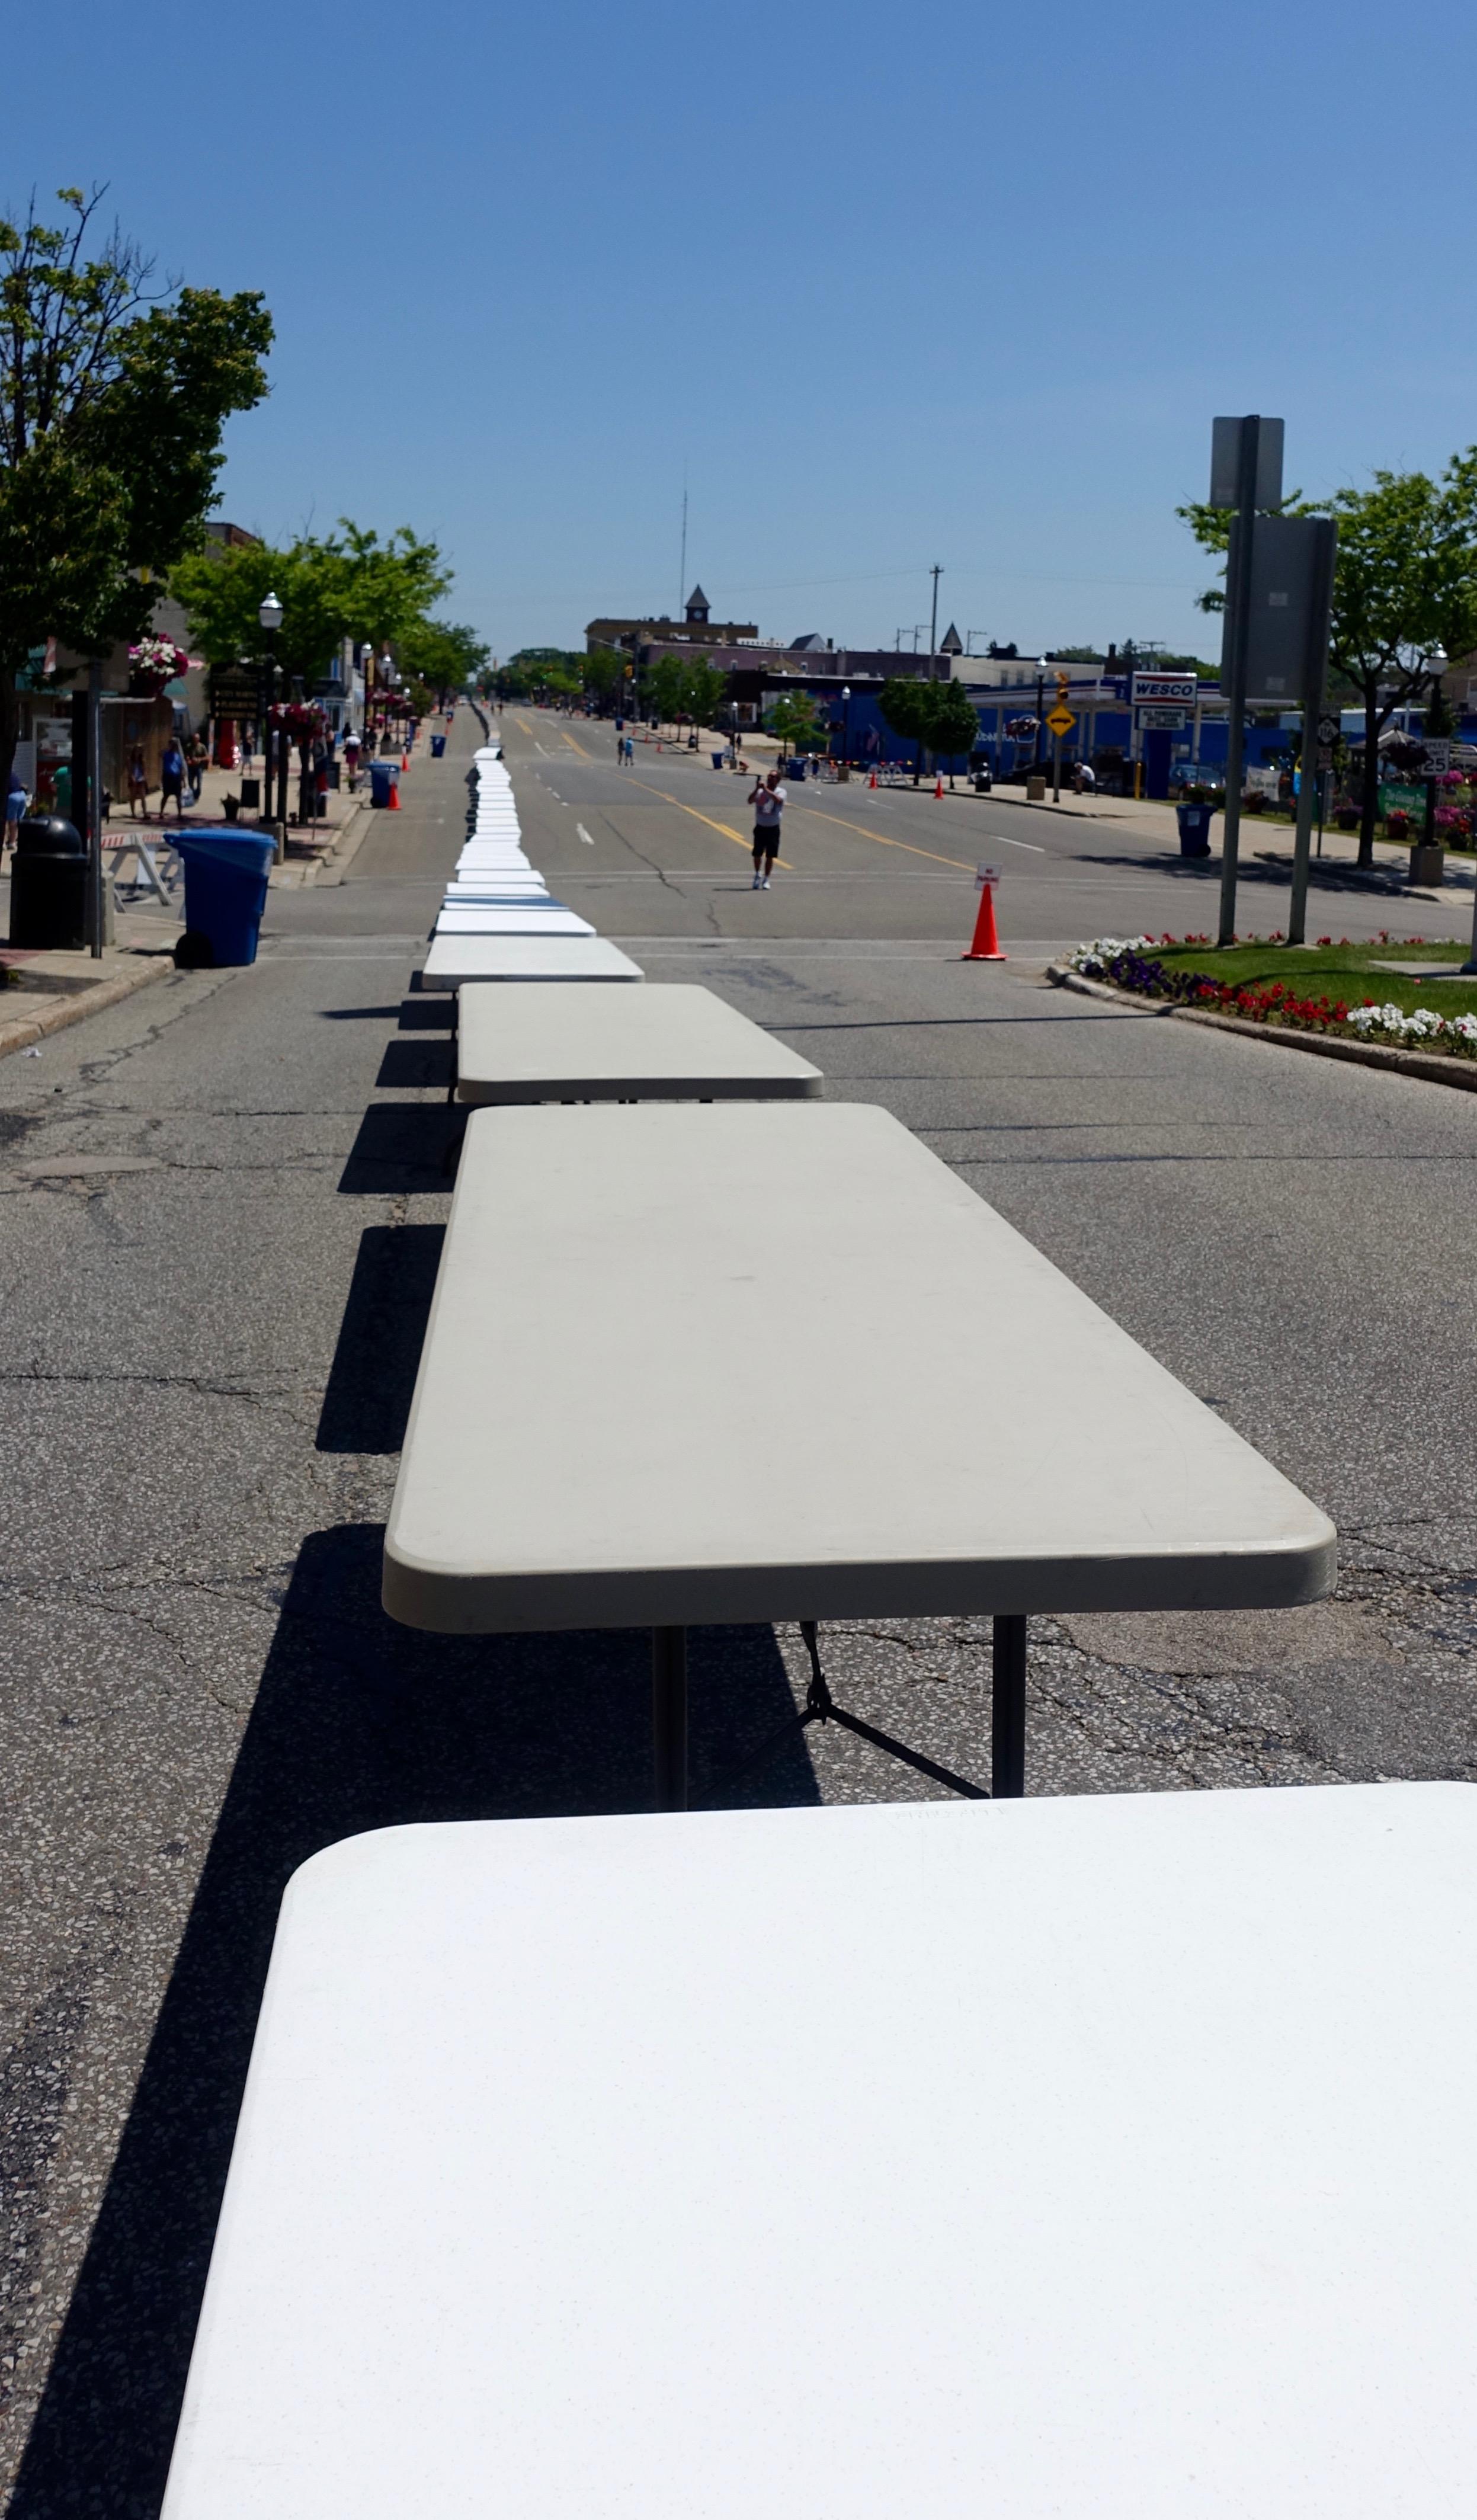 Hundreds of tables line Ludington Ave. at Ludington's World's Largest Sundae Attempt